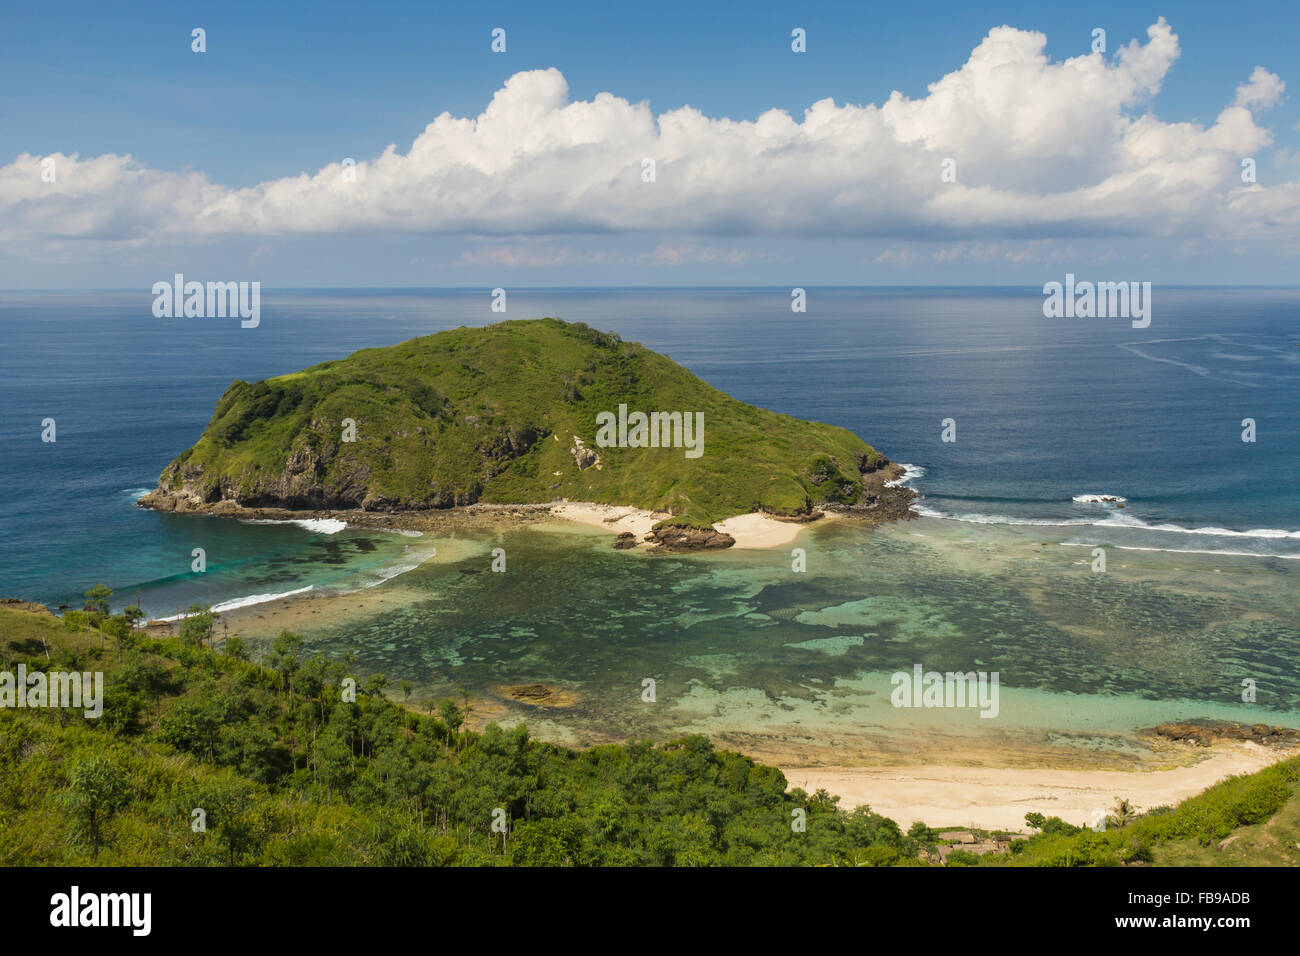 View to the islet Gili Nusa I Lombok I Indonesia - Stock Image